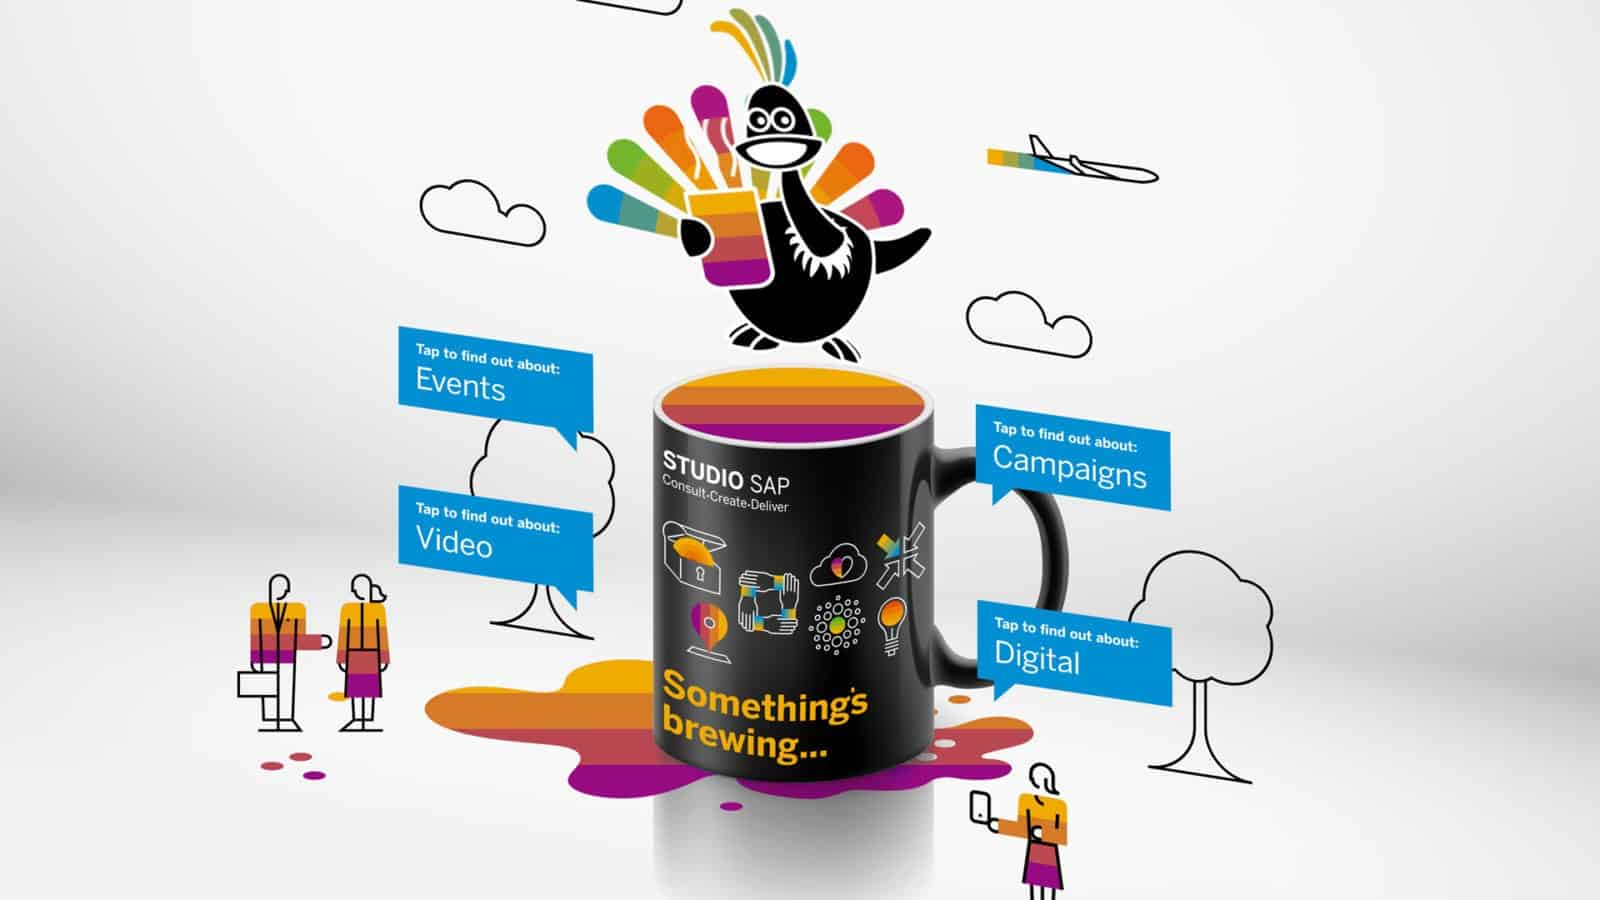 Studio SAP Augmented Reality Promo Campaign on Reydar